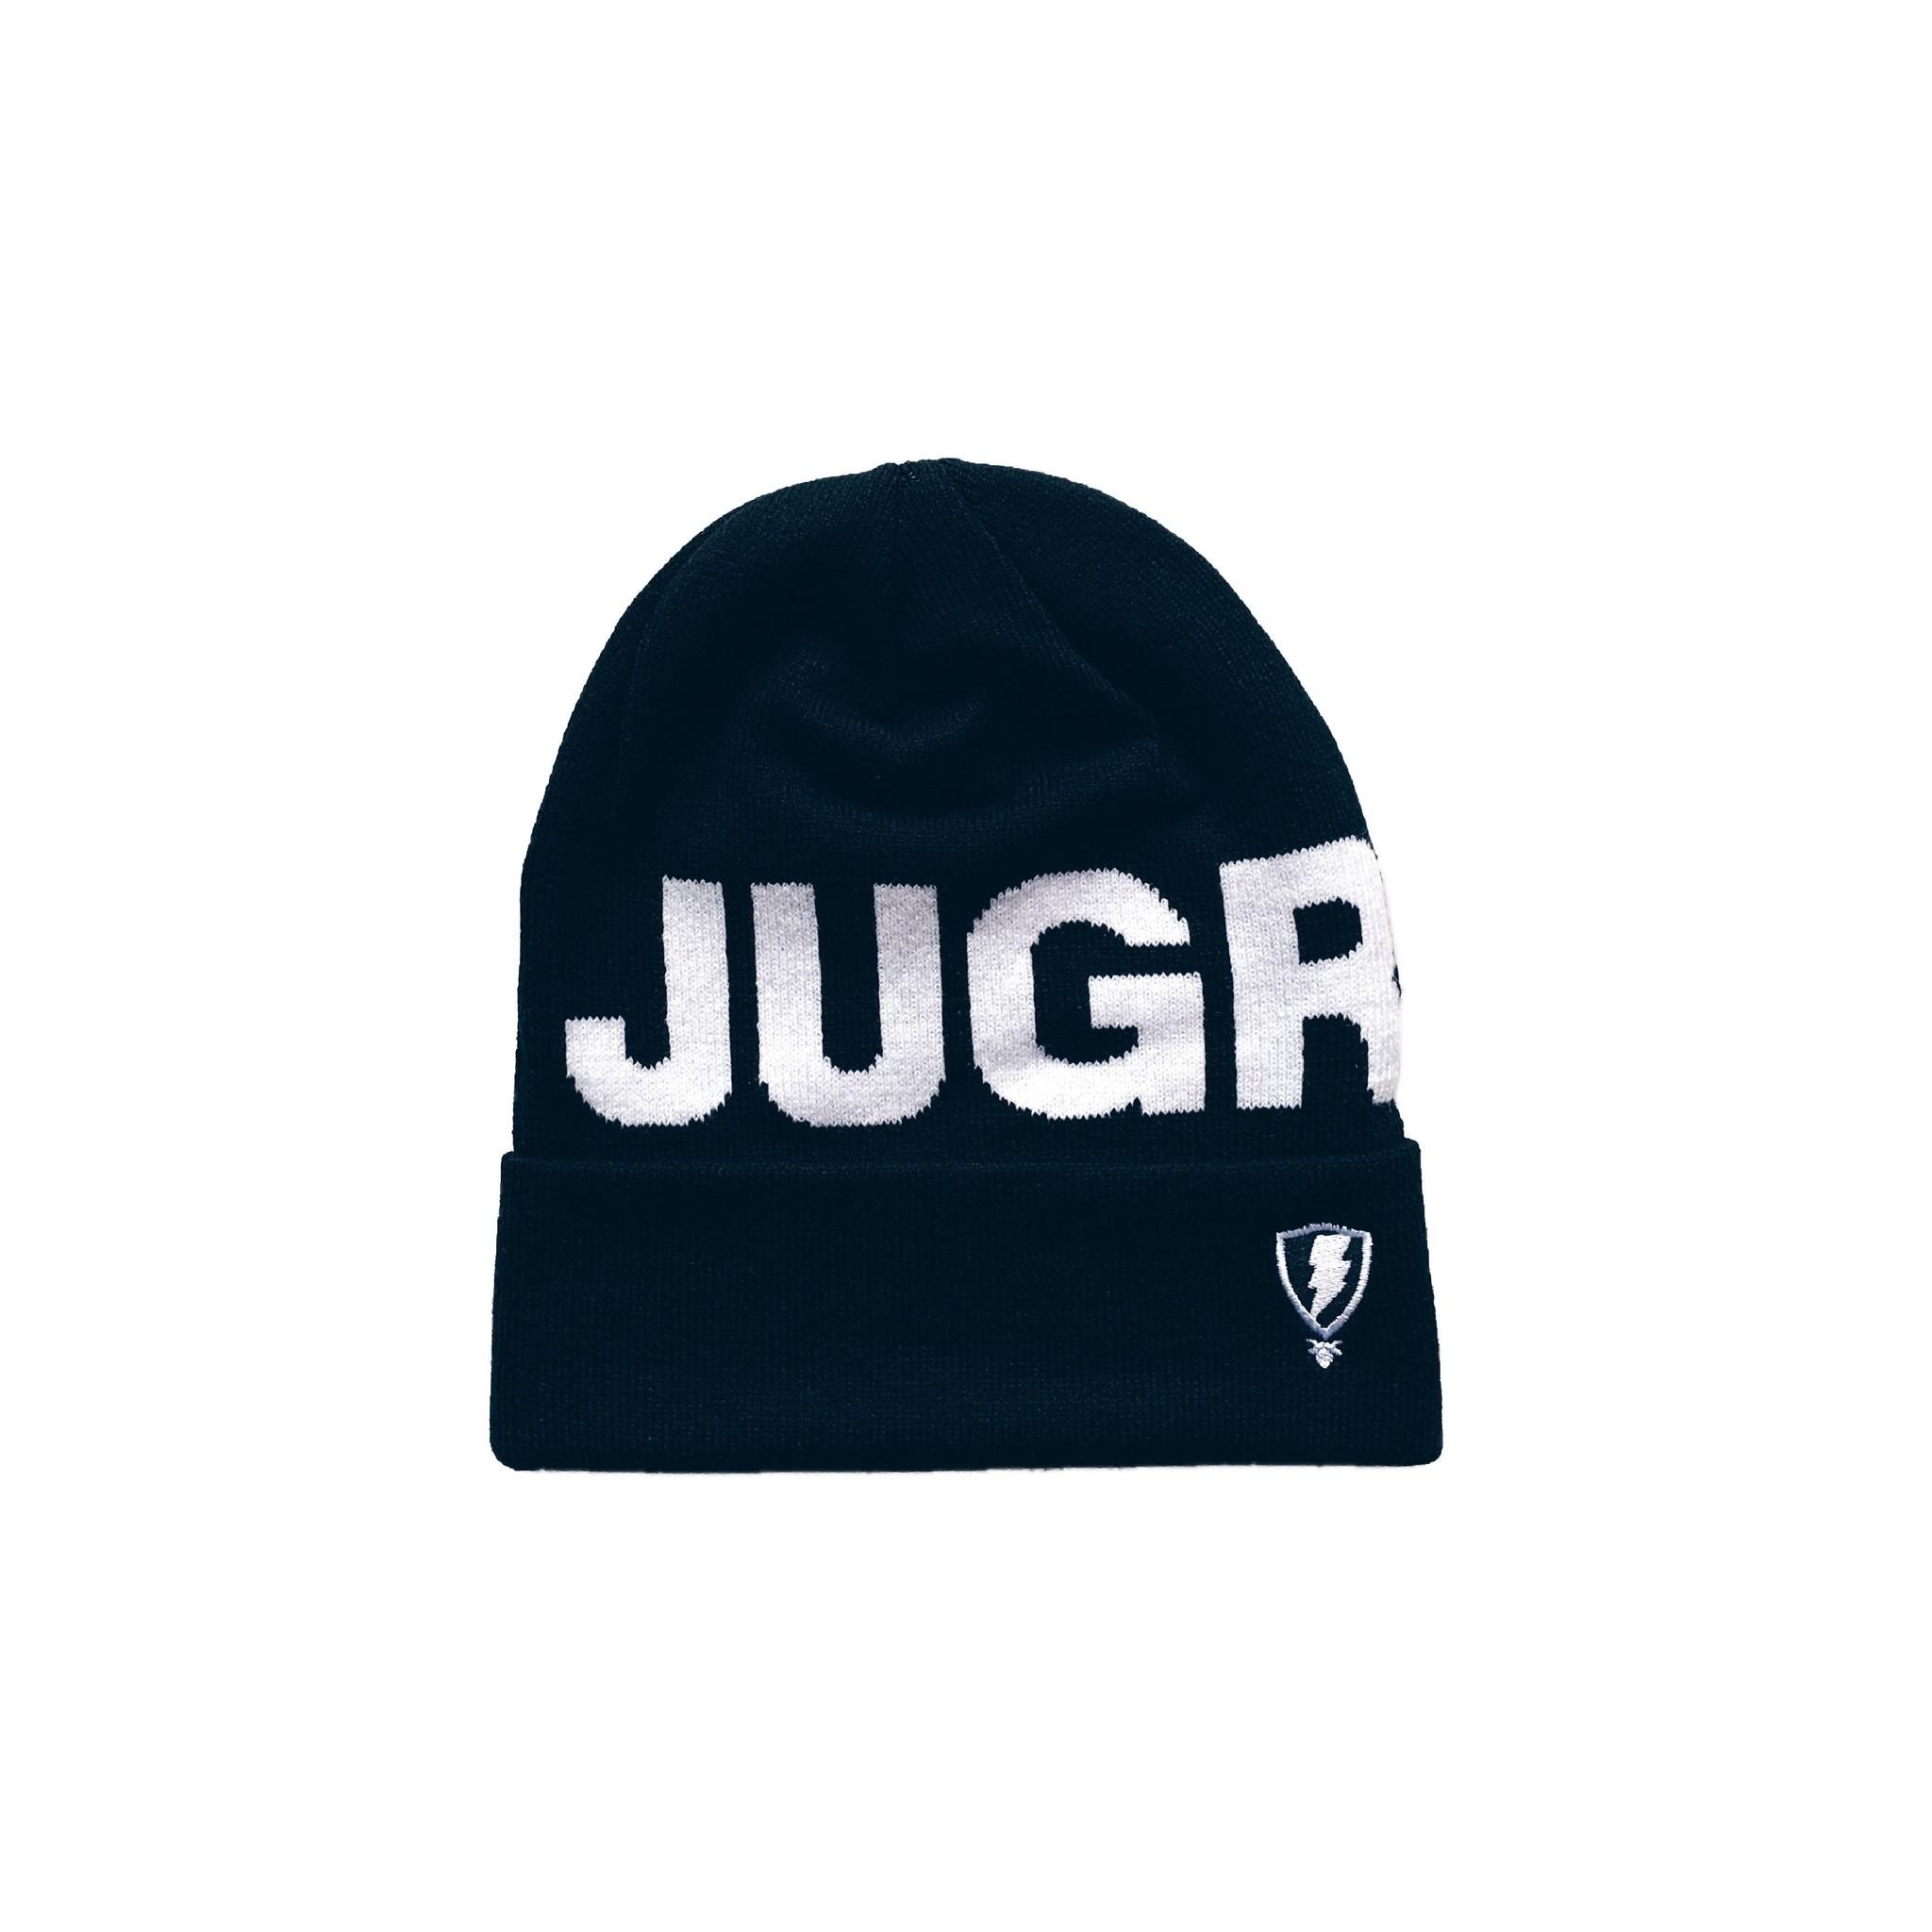 Jugrnaut Jugrnaut Bold Text Logo Beanie Black